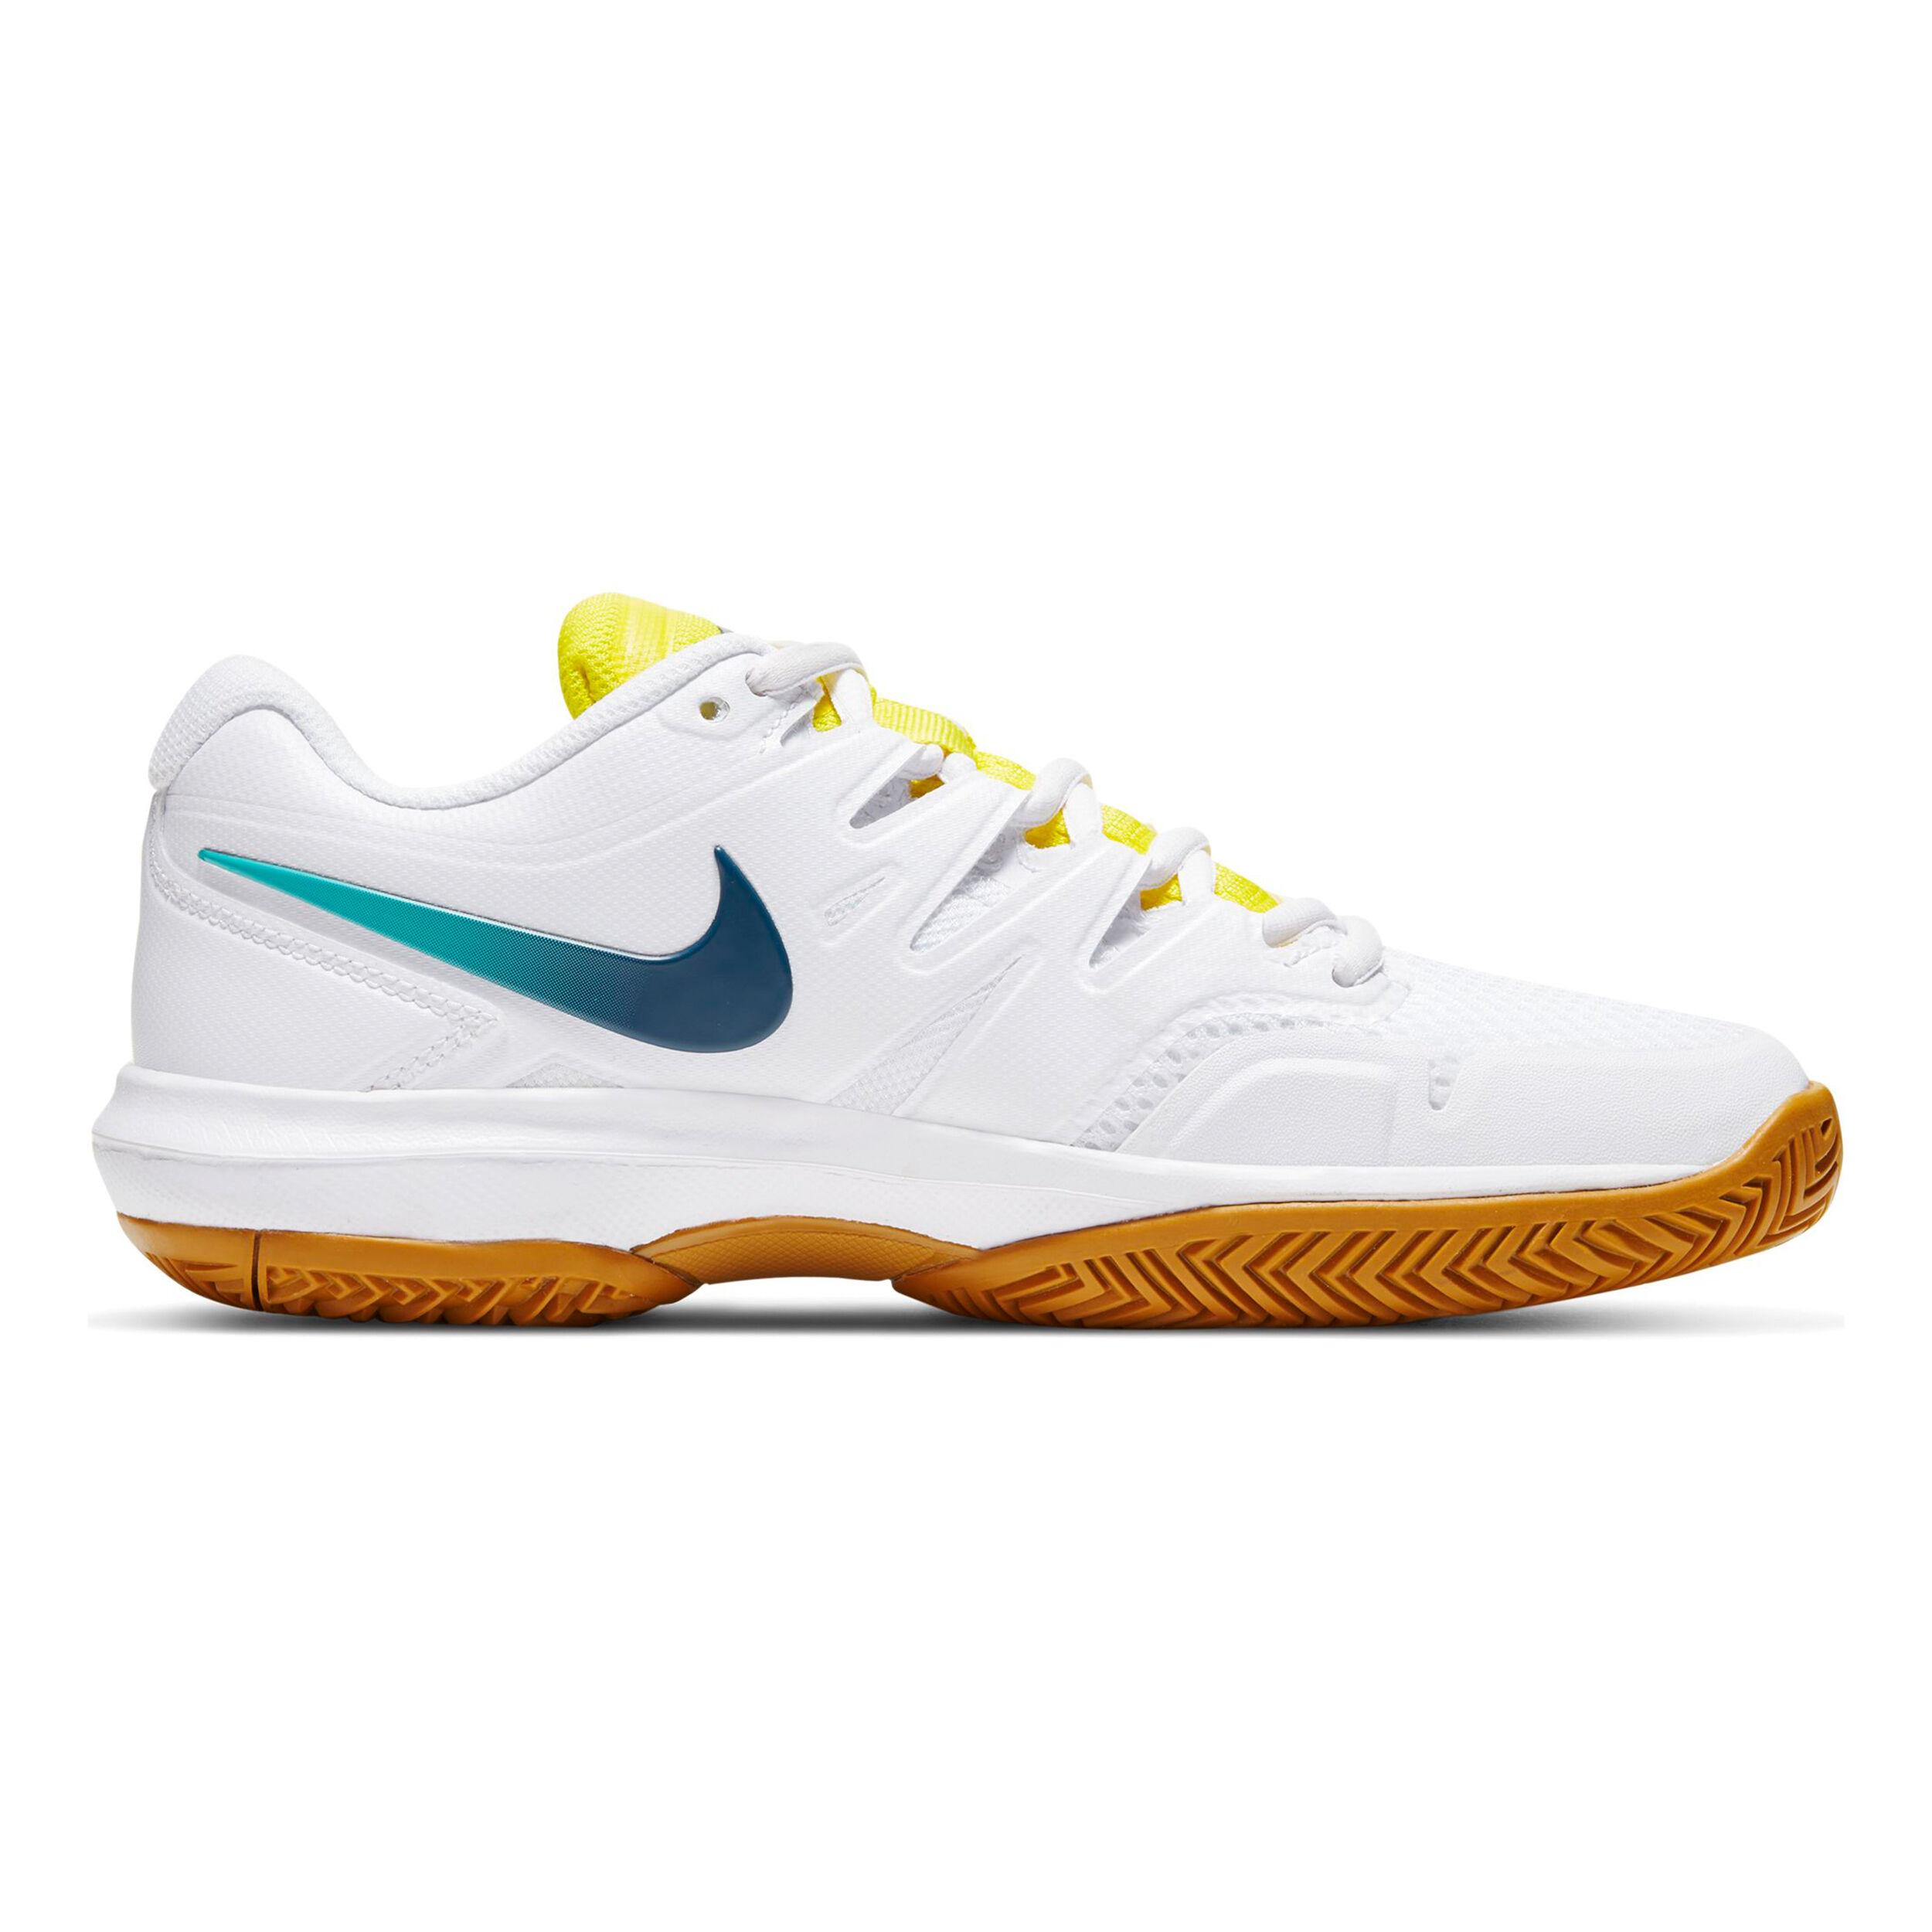 Nike Air Zoom Prestige Chaussures Toutes Surfaces Femmes - Blanc ...